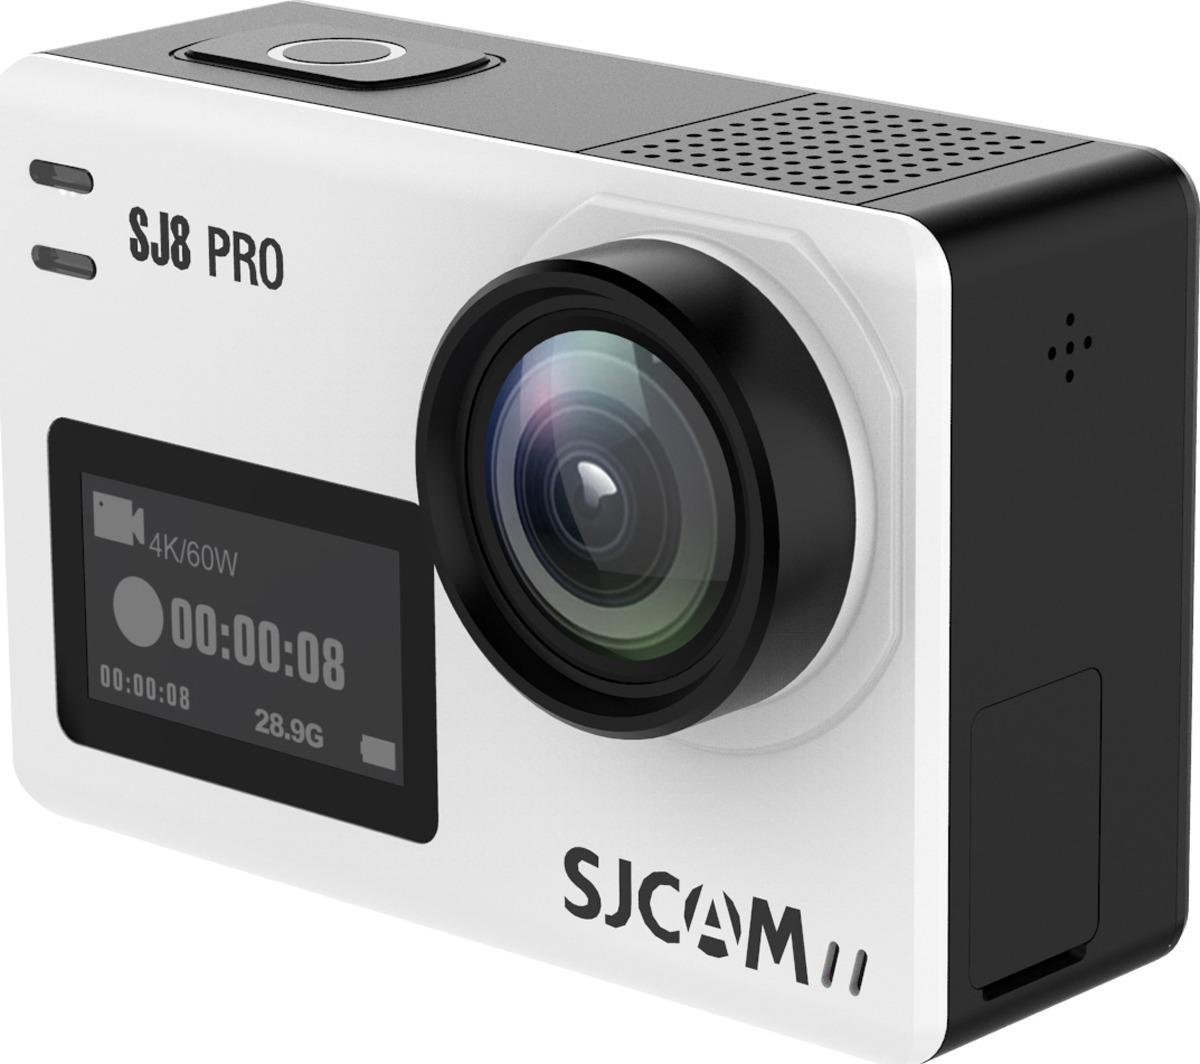 Экшн-камера SJCAM SJ8 Pro, SJ8 Pro (white), серебристый original sjcam sj8 pro 4k 60fps wifi action camera